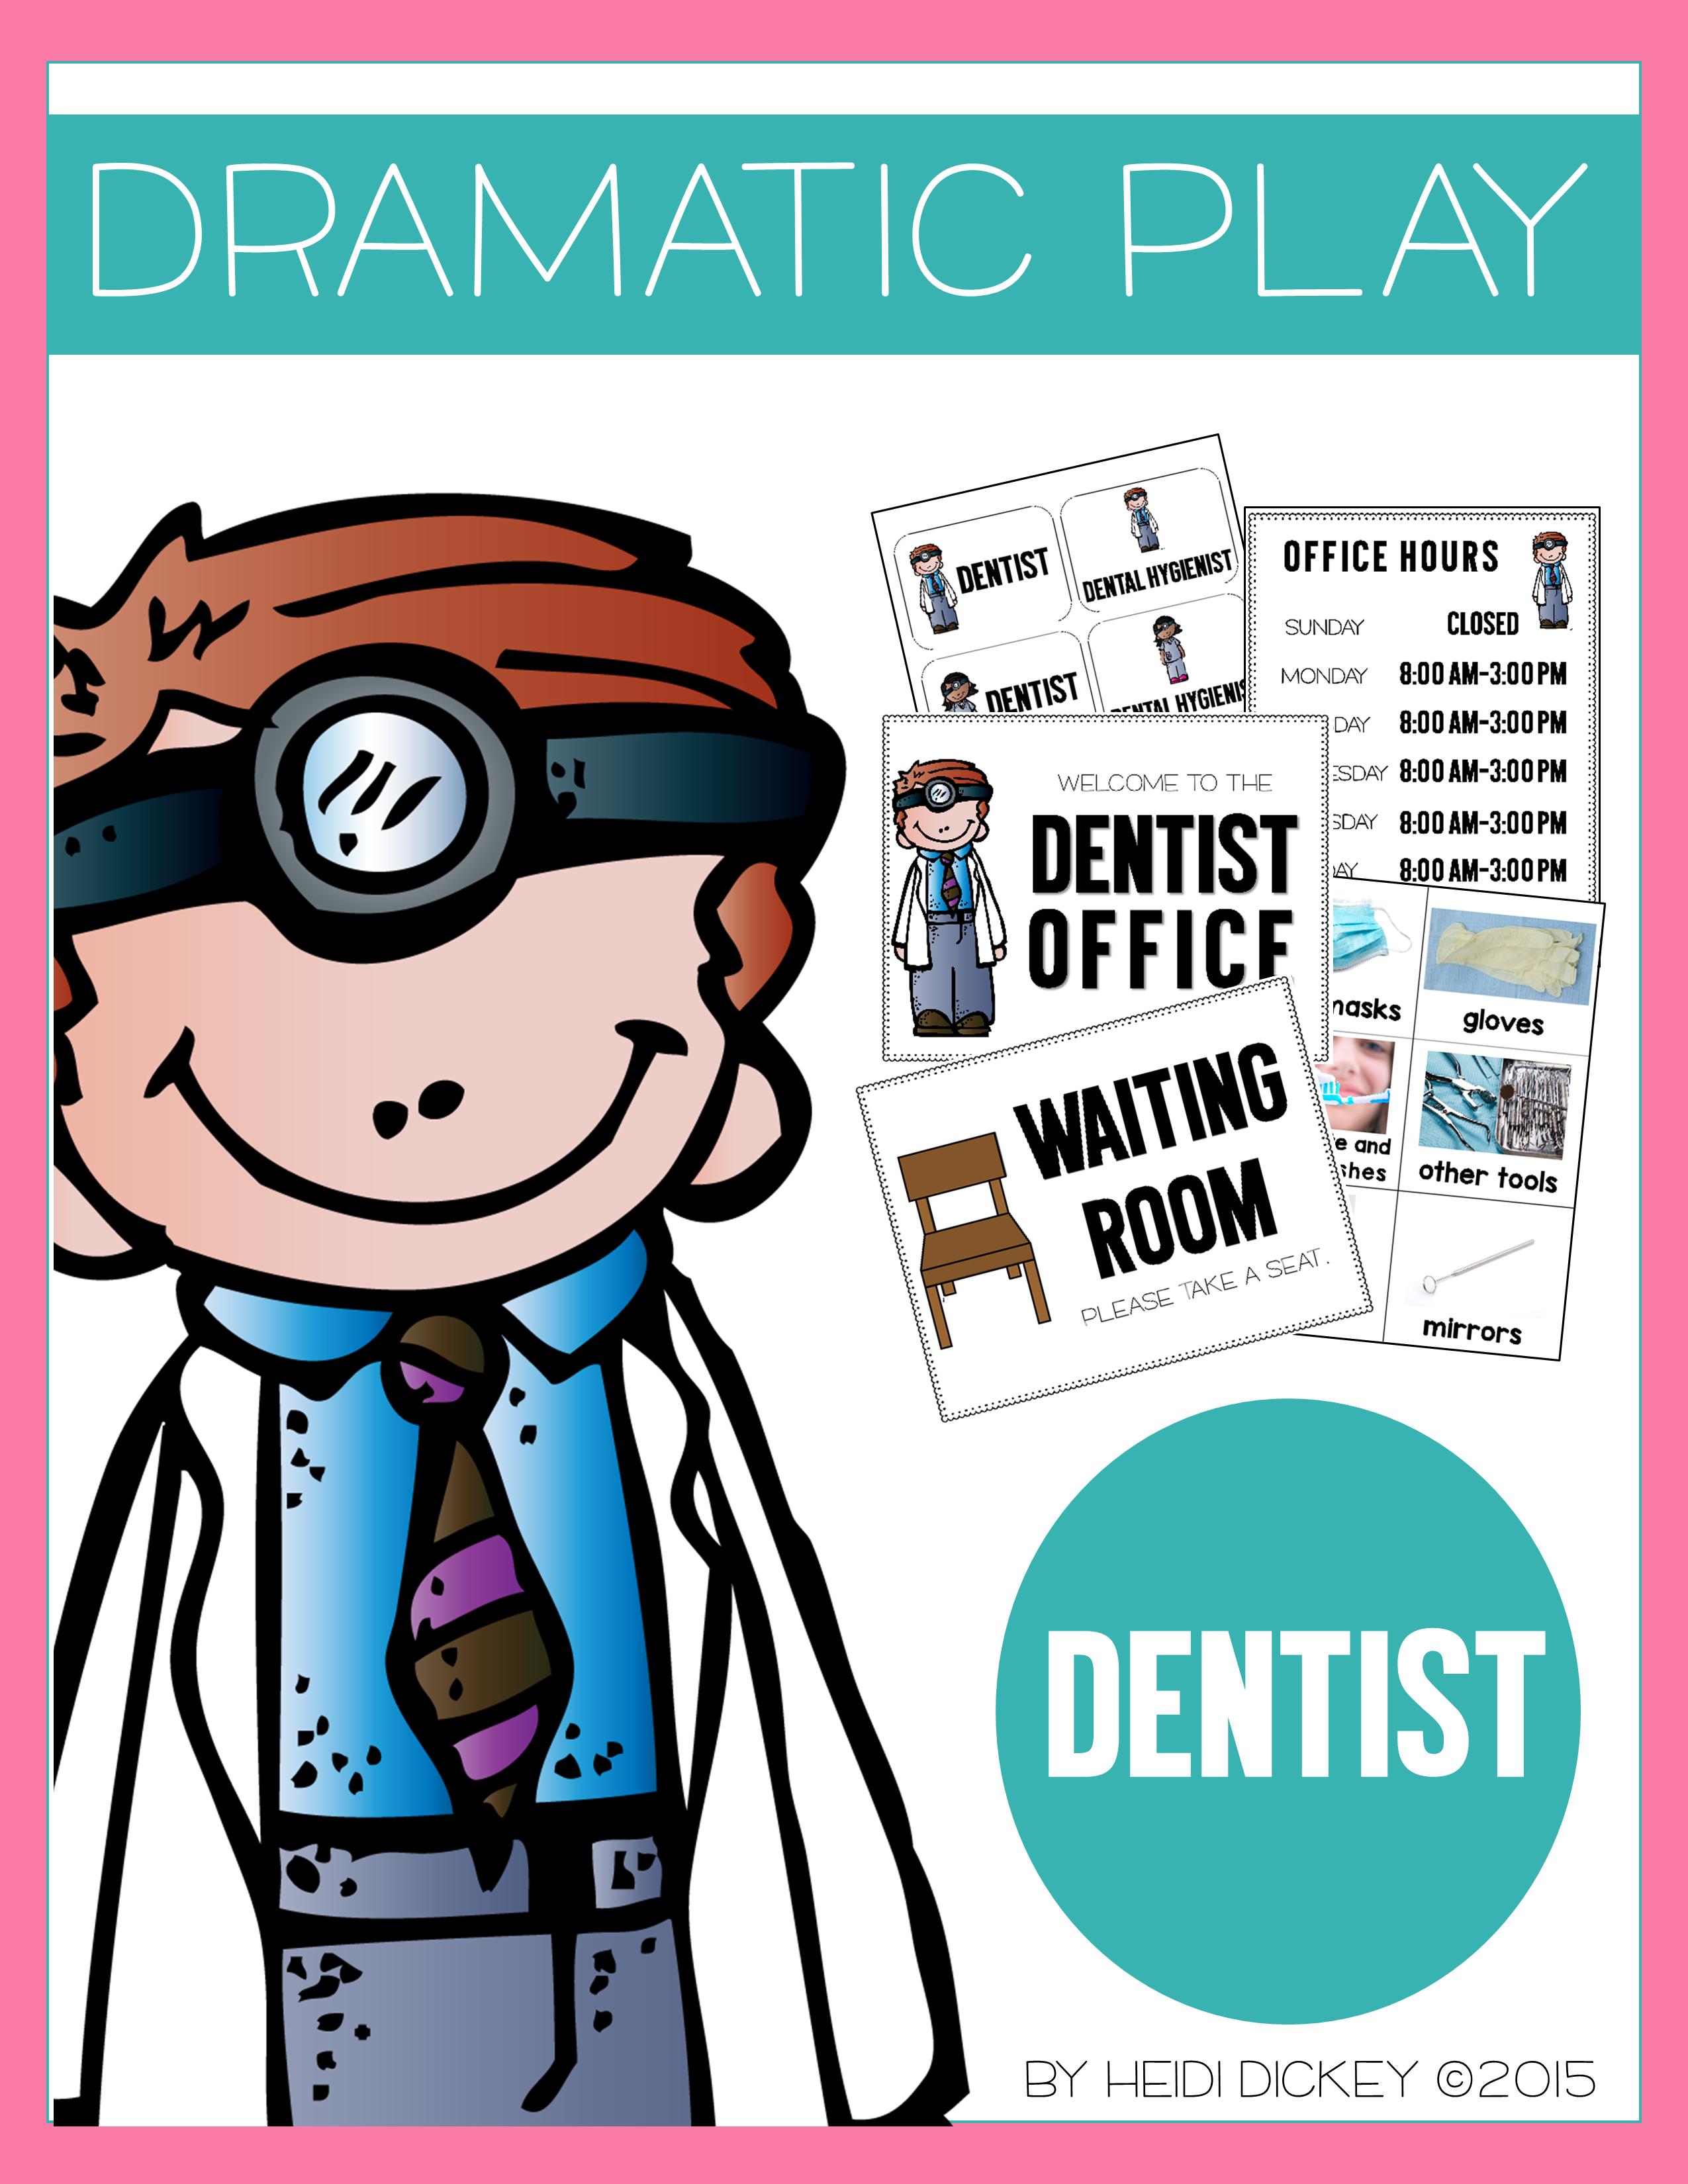 Dentist Dramatic Play